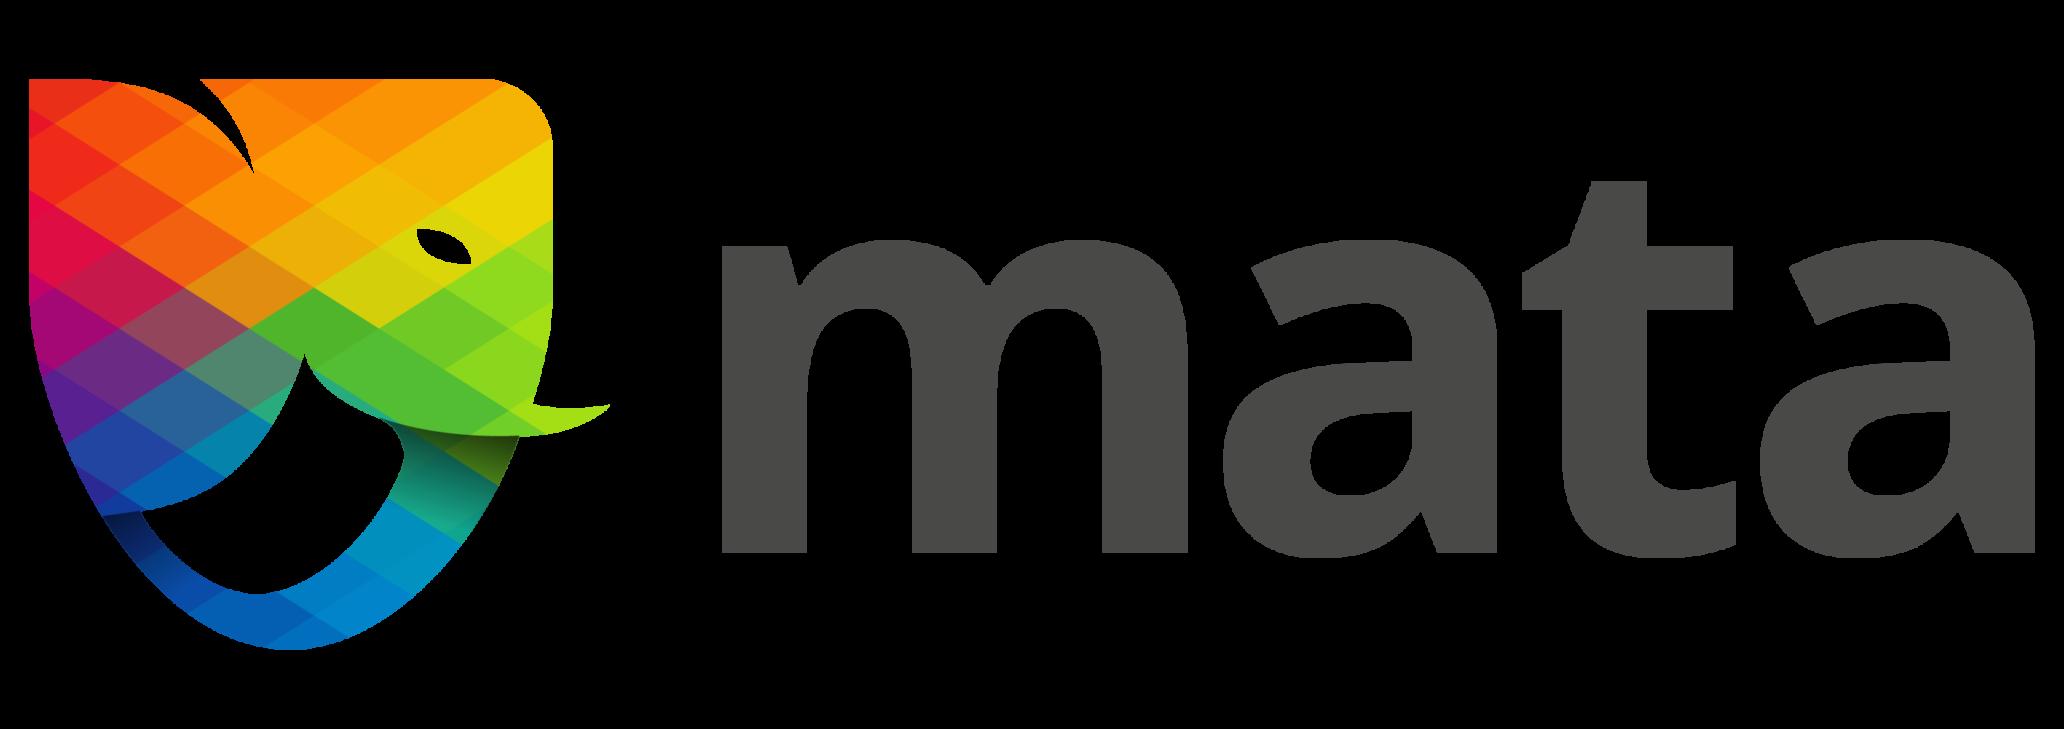 logo editeur mata nouveau 2021